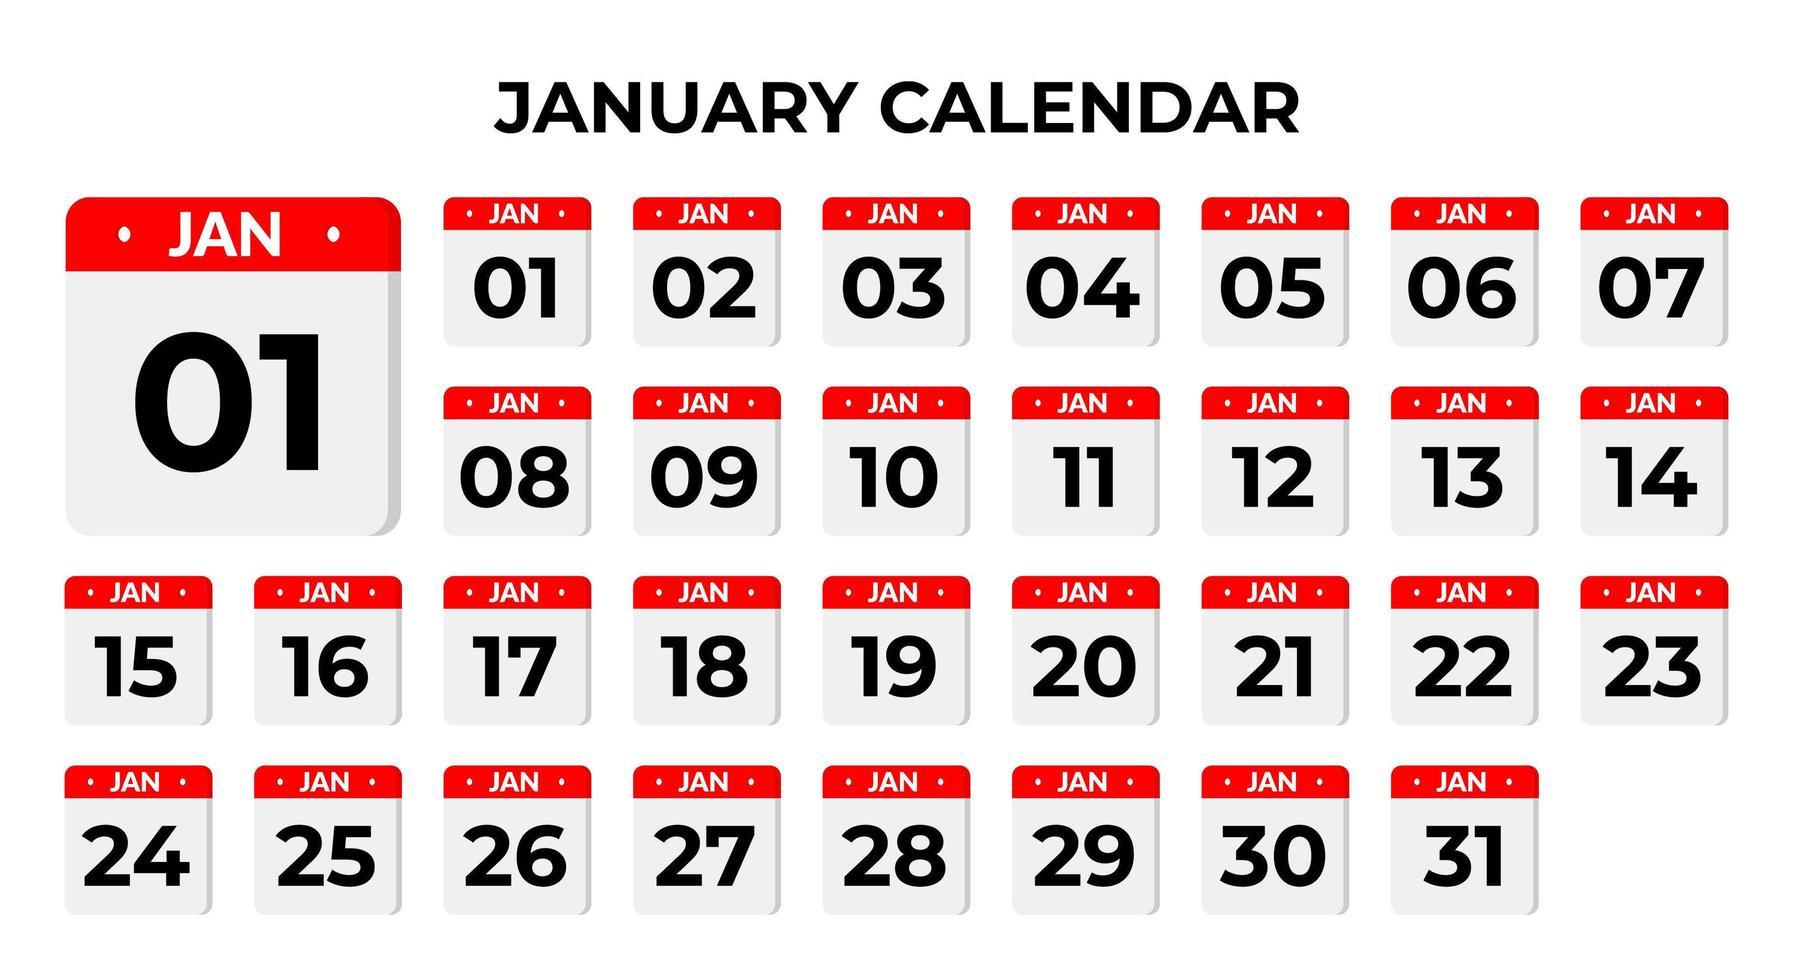 Januar Kalender Symbole vektor